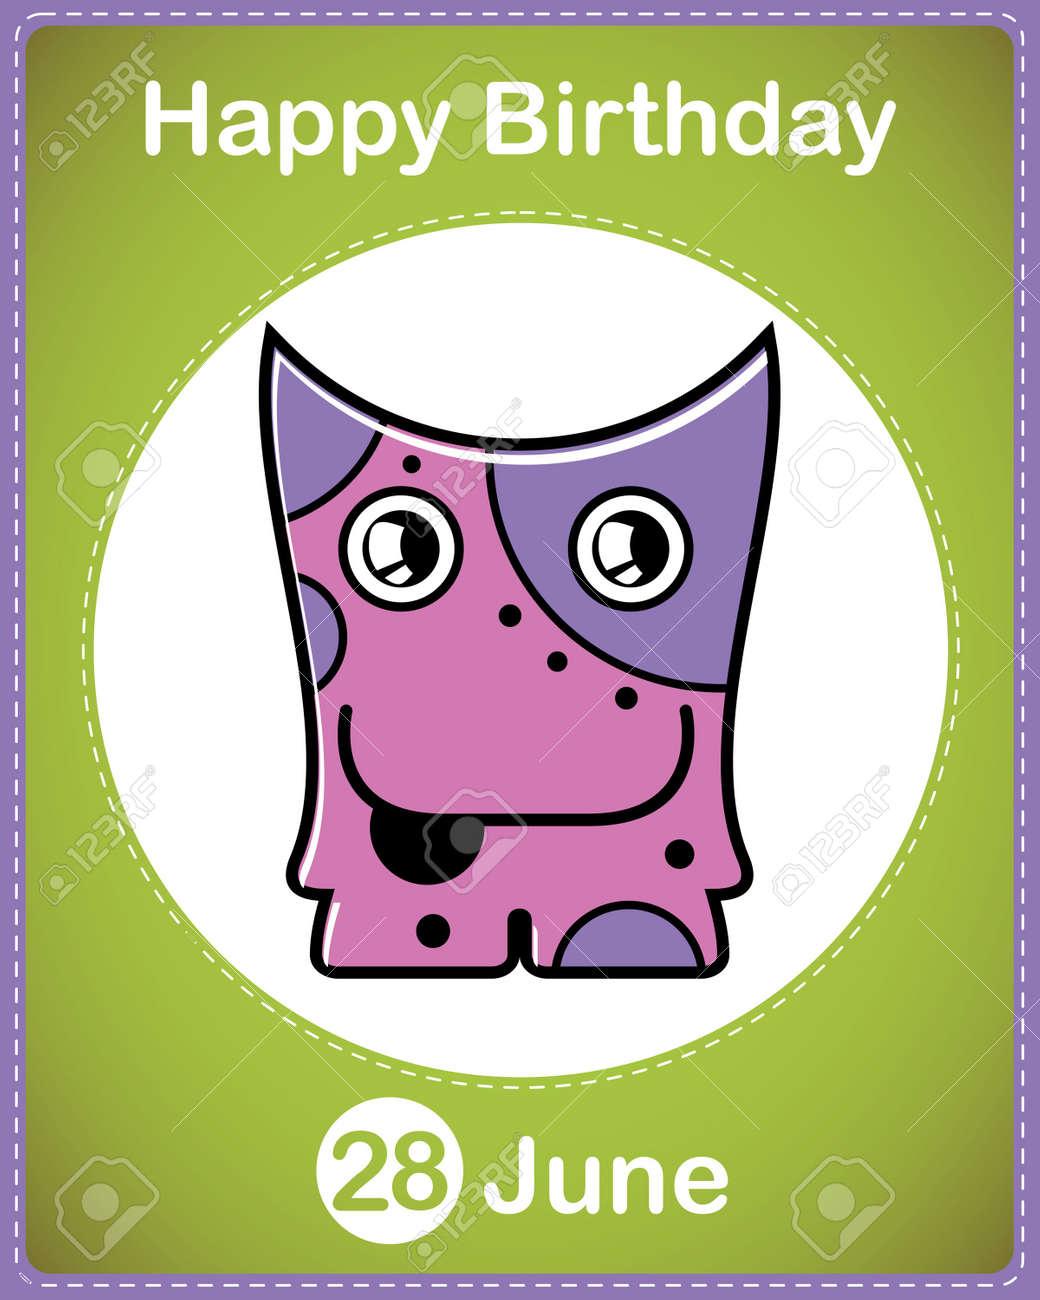 Happy birthday card with cute cartoon monster Stock Vector - 17856963